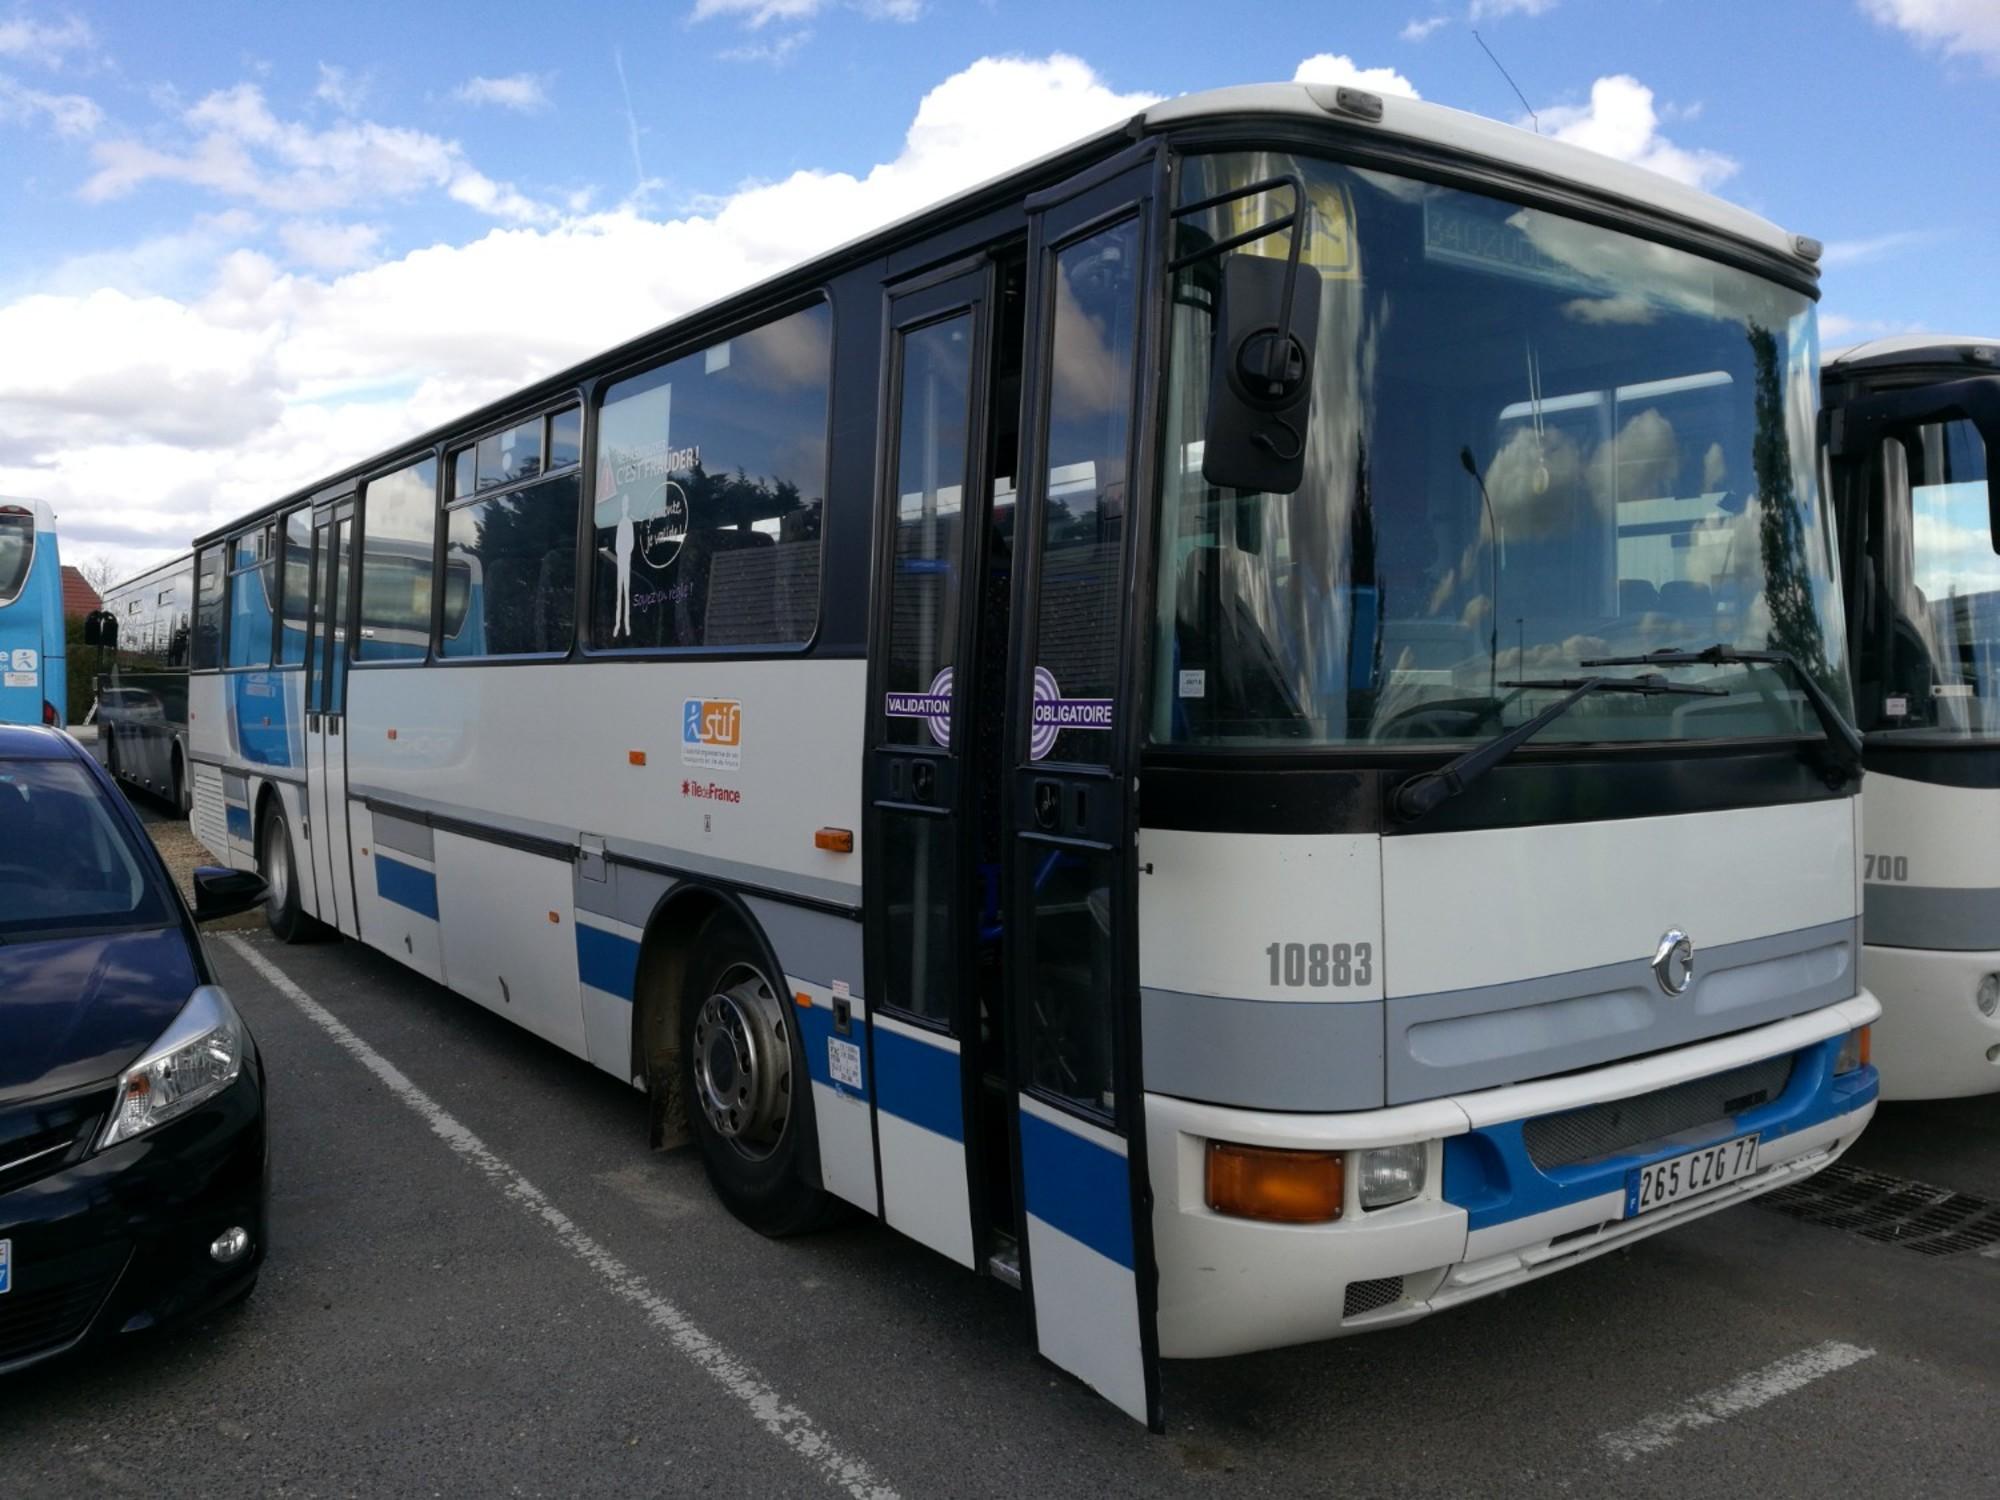 karosa recreo 10883 car bus d 39 occasion aux ench res. Black Bedroom Furniture Sets. Home Design Ideas